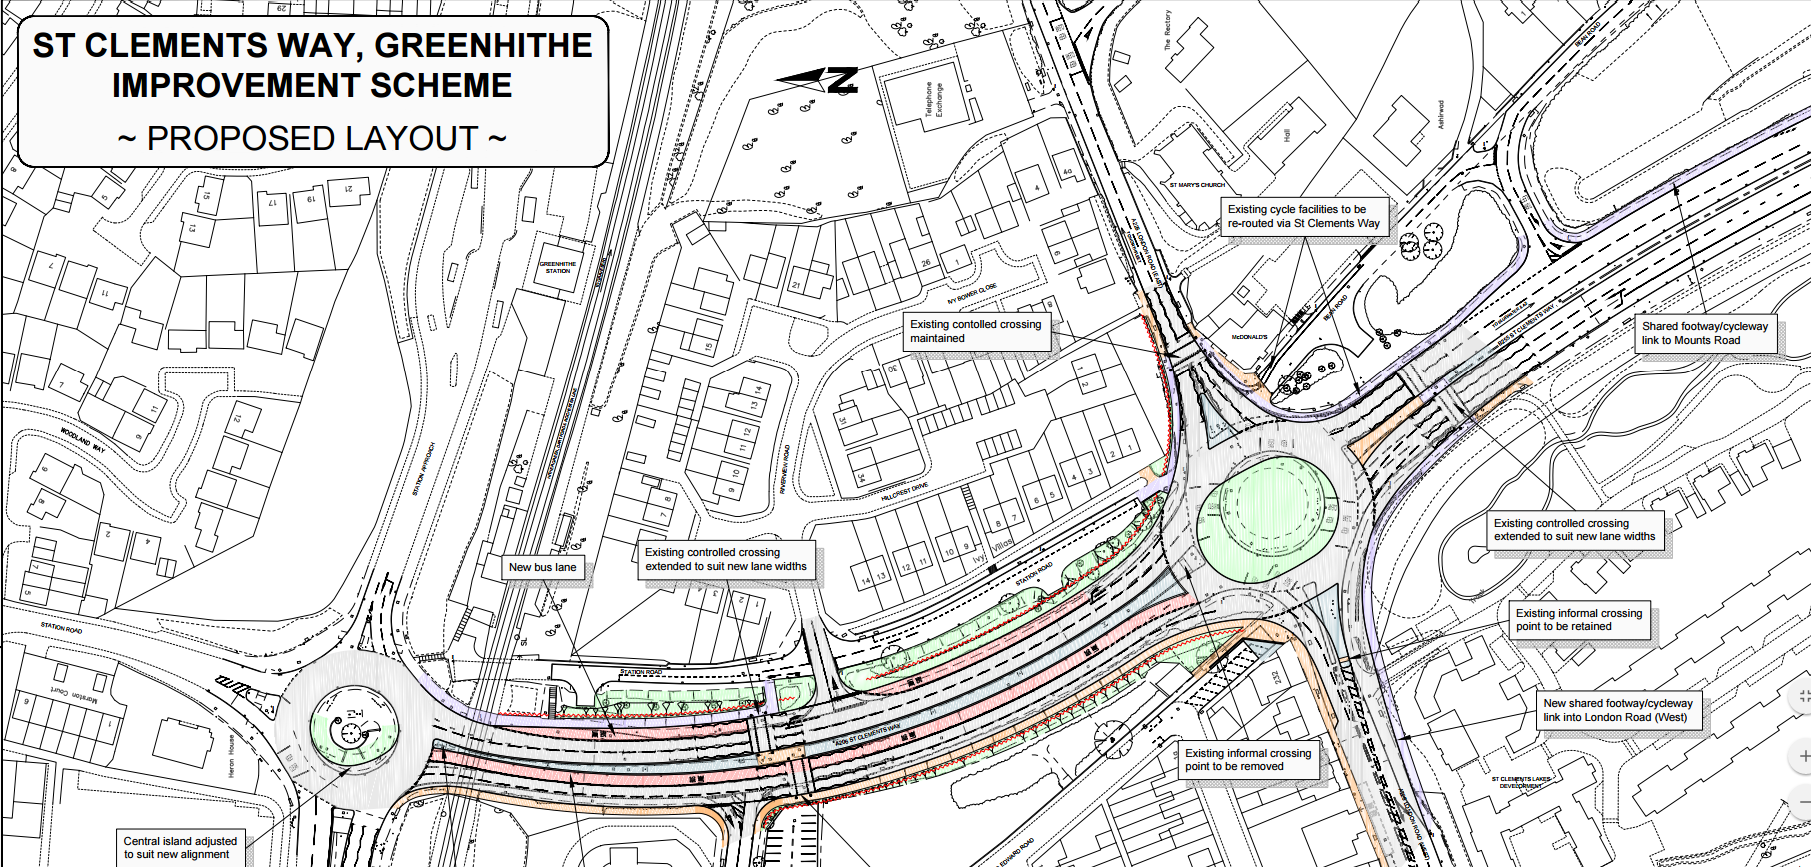 St Clements Way, Greenhithe Improvement Scheme